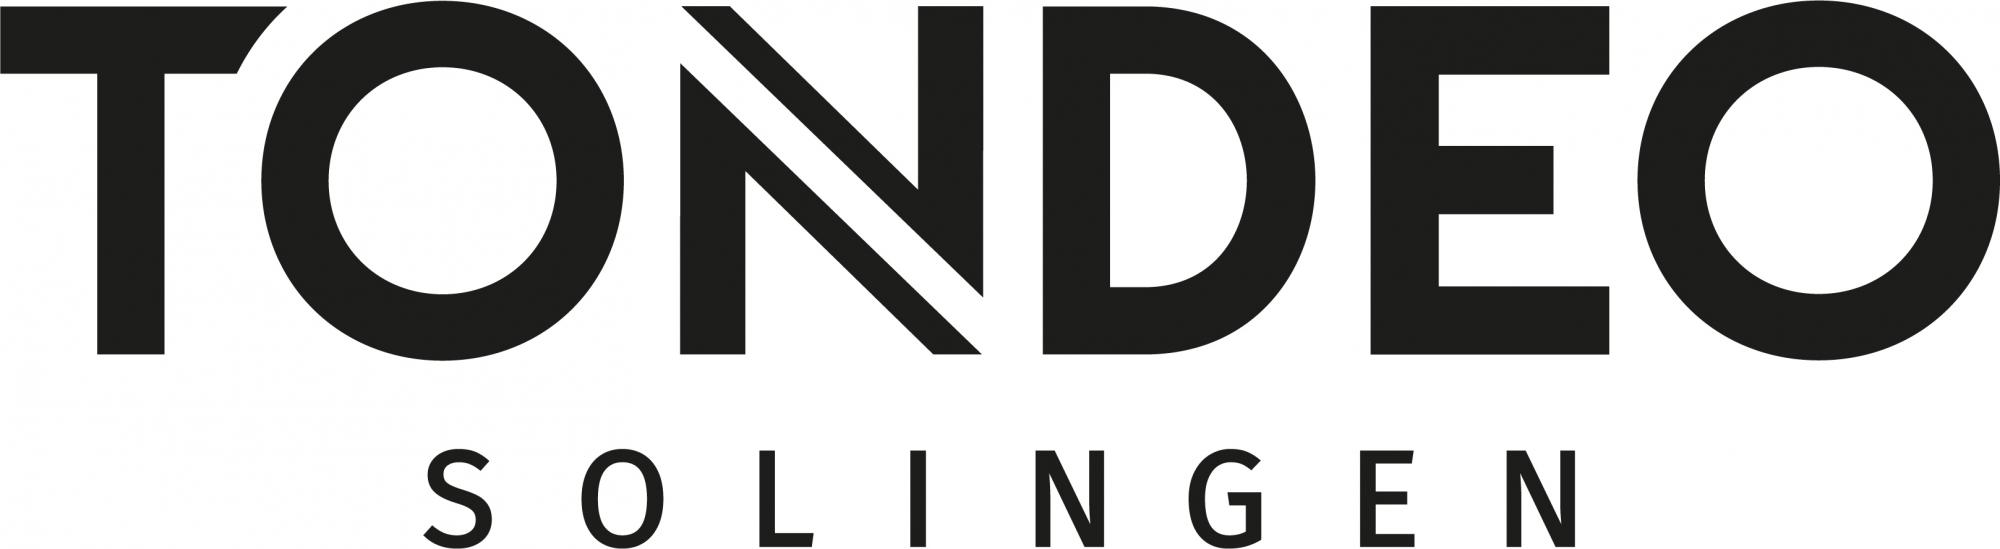 Tondeo - Gertsson Trading AB